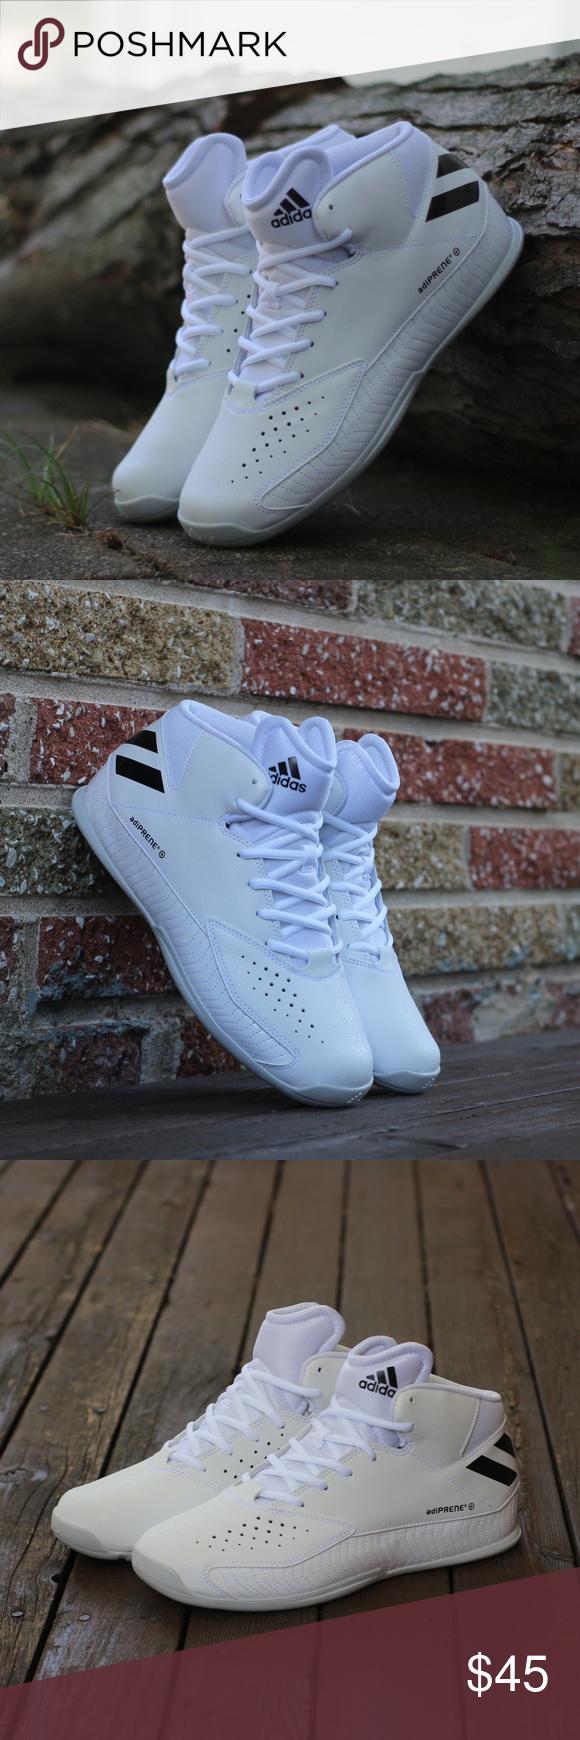 3686c18c5f0 Adidas Mens Nxt Lvl Spd V Basketball Shoes BW0624 Brand New